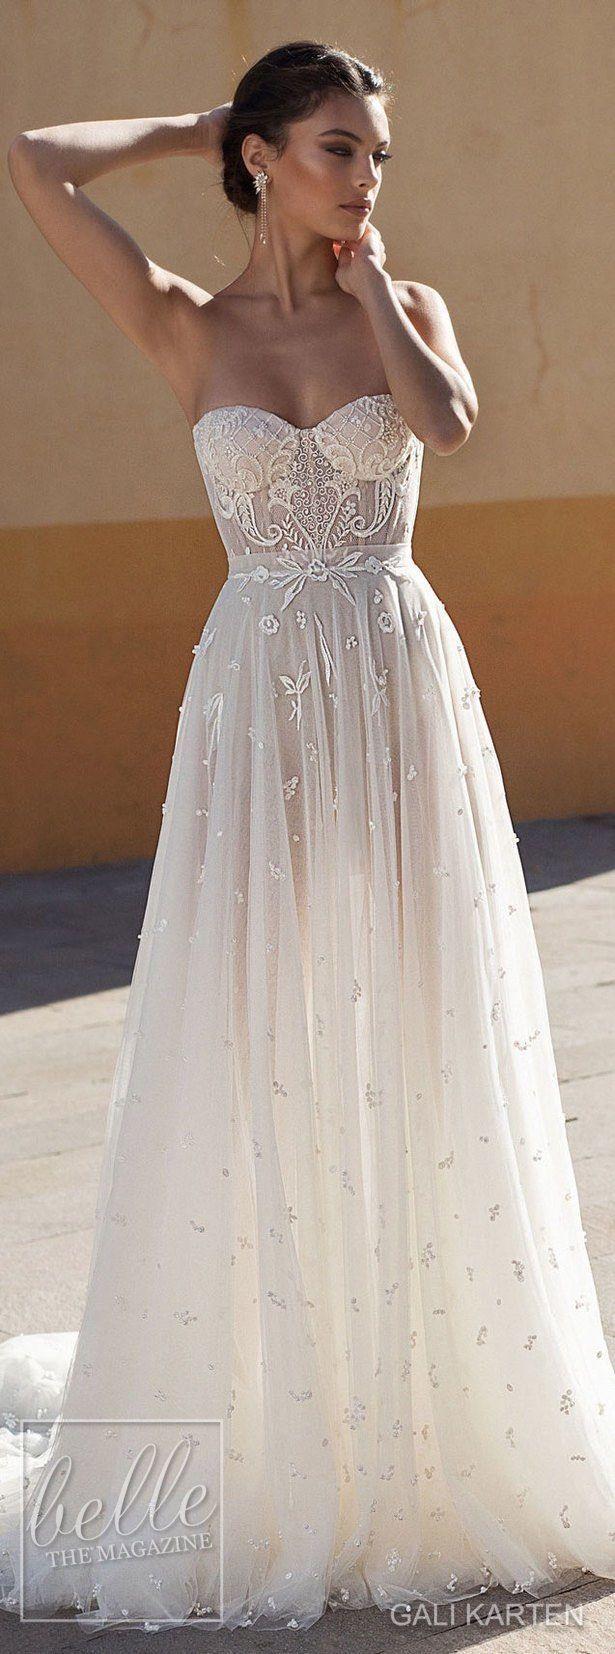 Gali karten wedding dress burano bridal collection